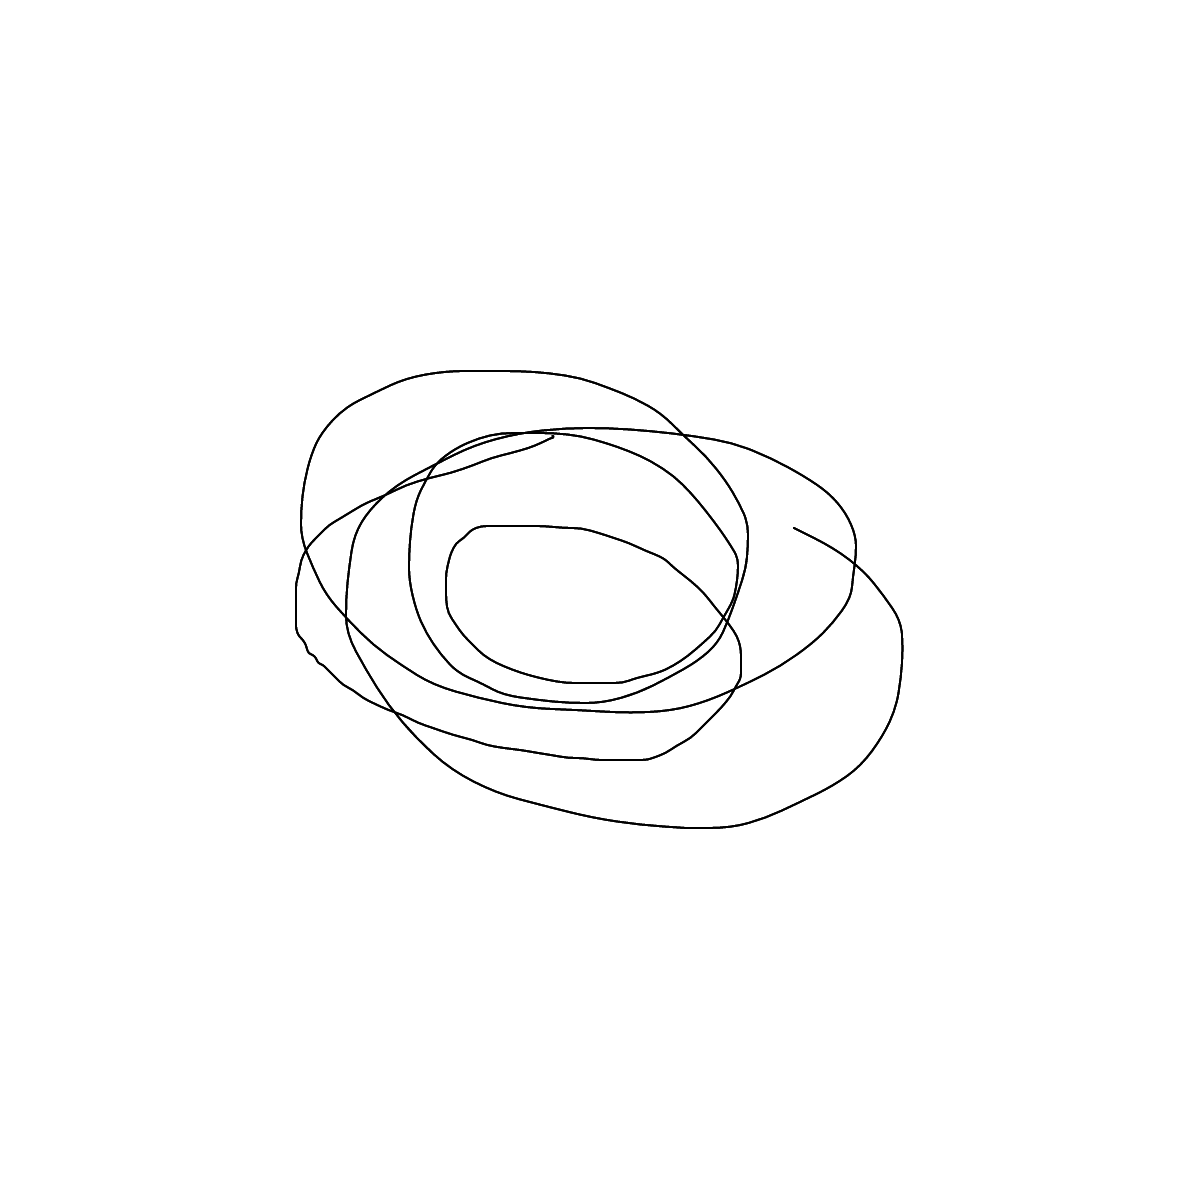 BAAAM drawing#5239 lat:51.1793403625488300lng: 9.4921855926513670